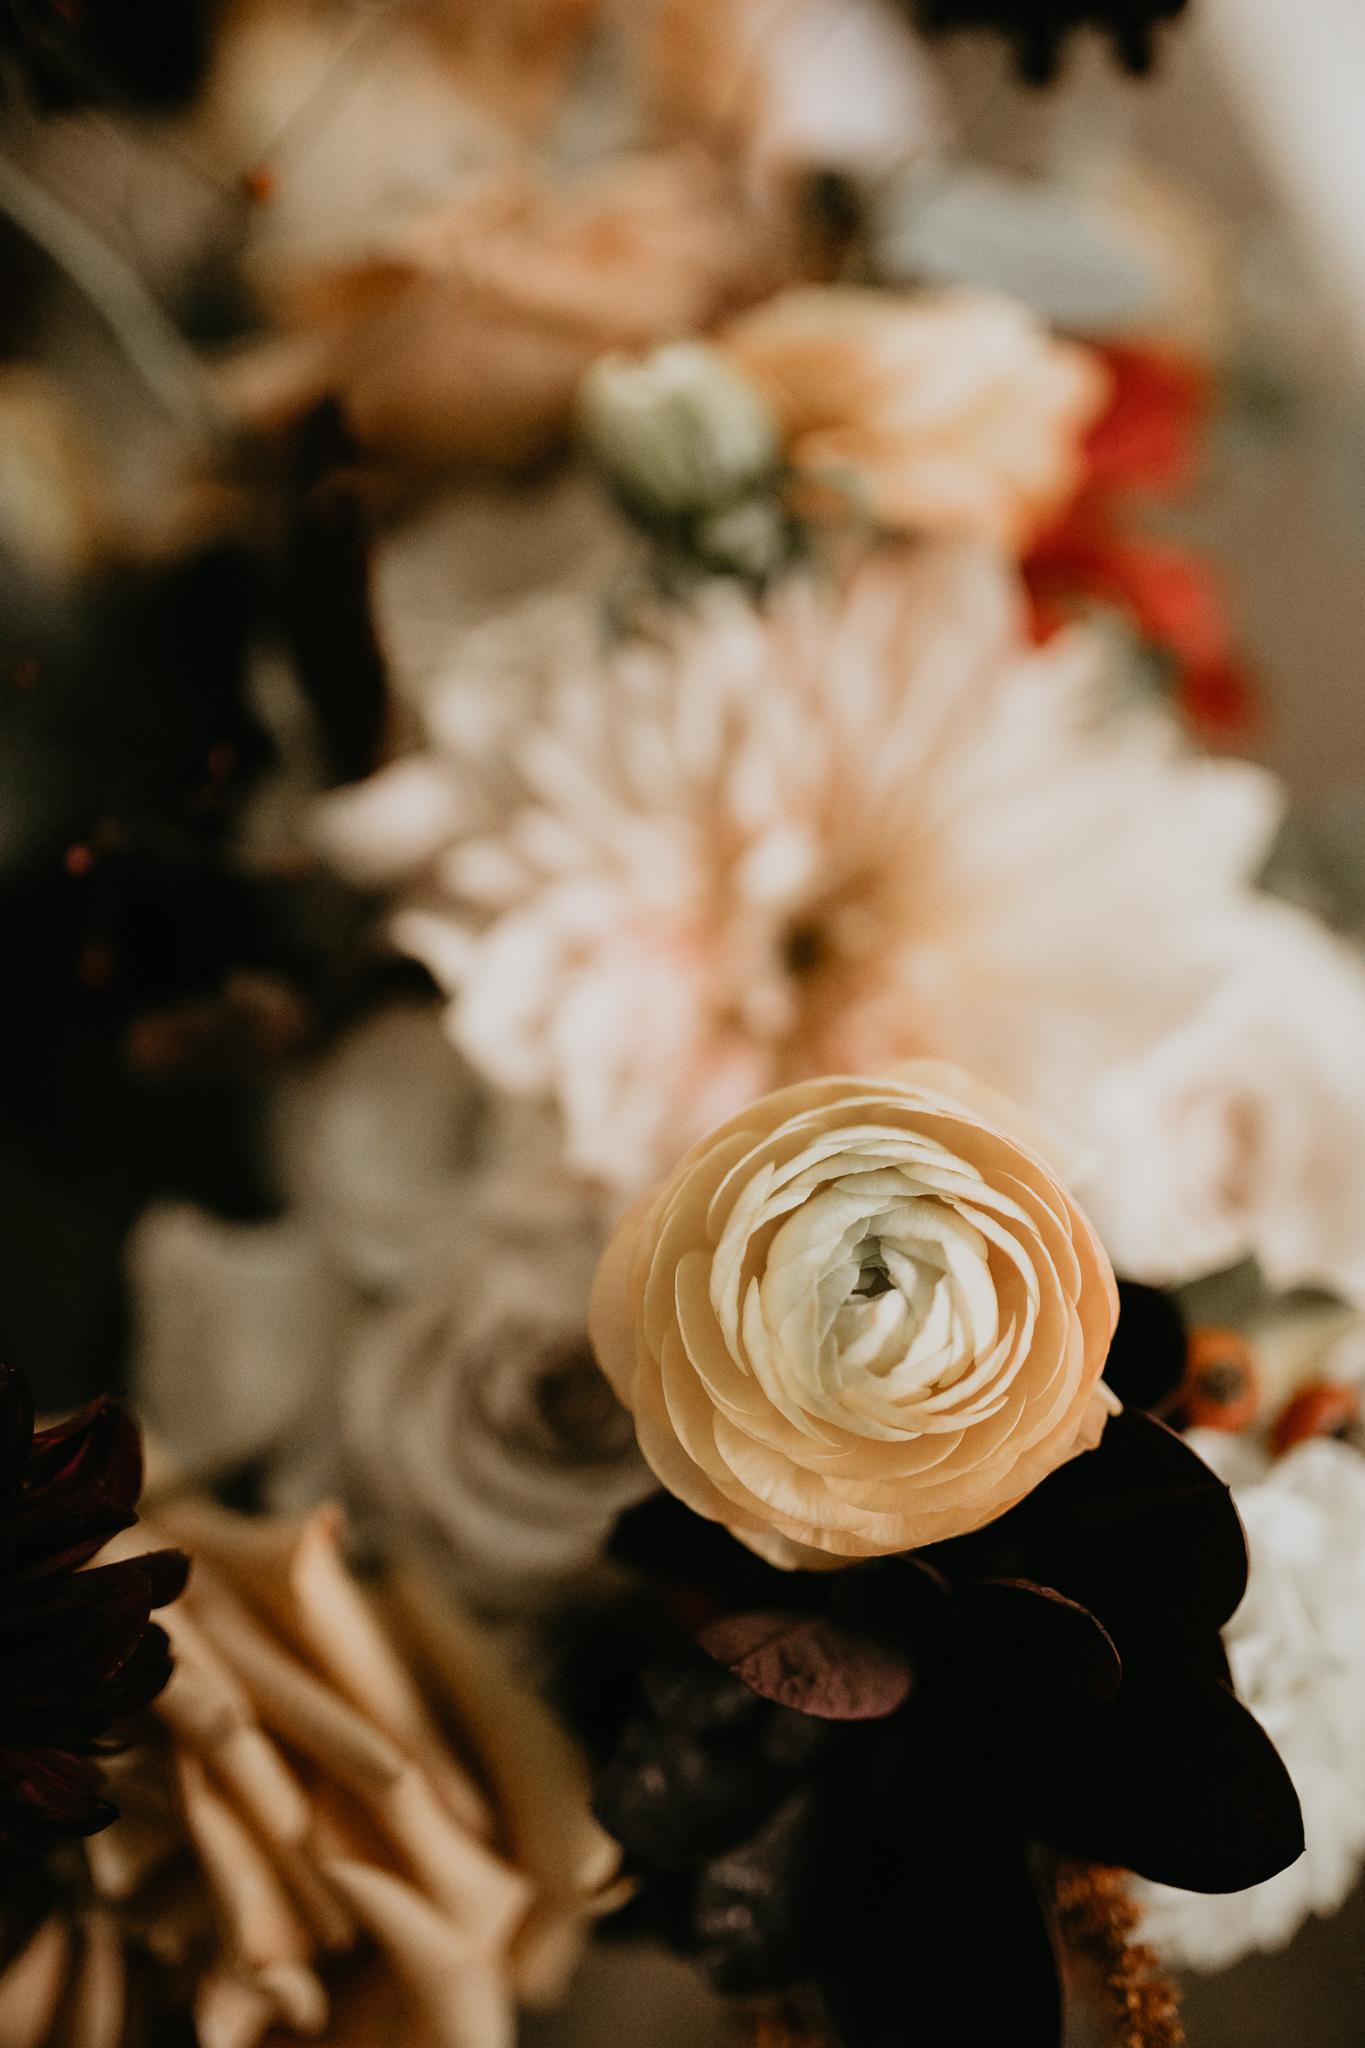 Sundara - Weddings - Virginia - Best Wedding Photographer - Pat Cori Photography-3.jpg